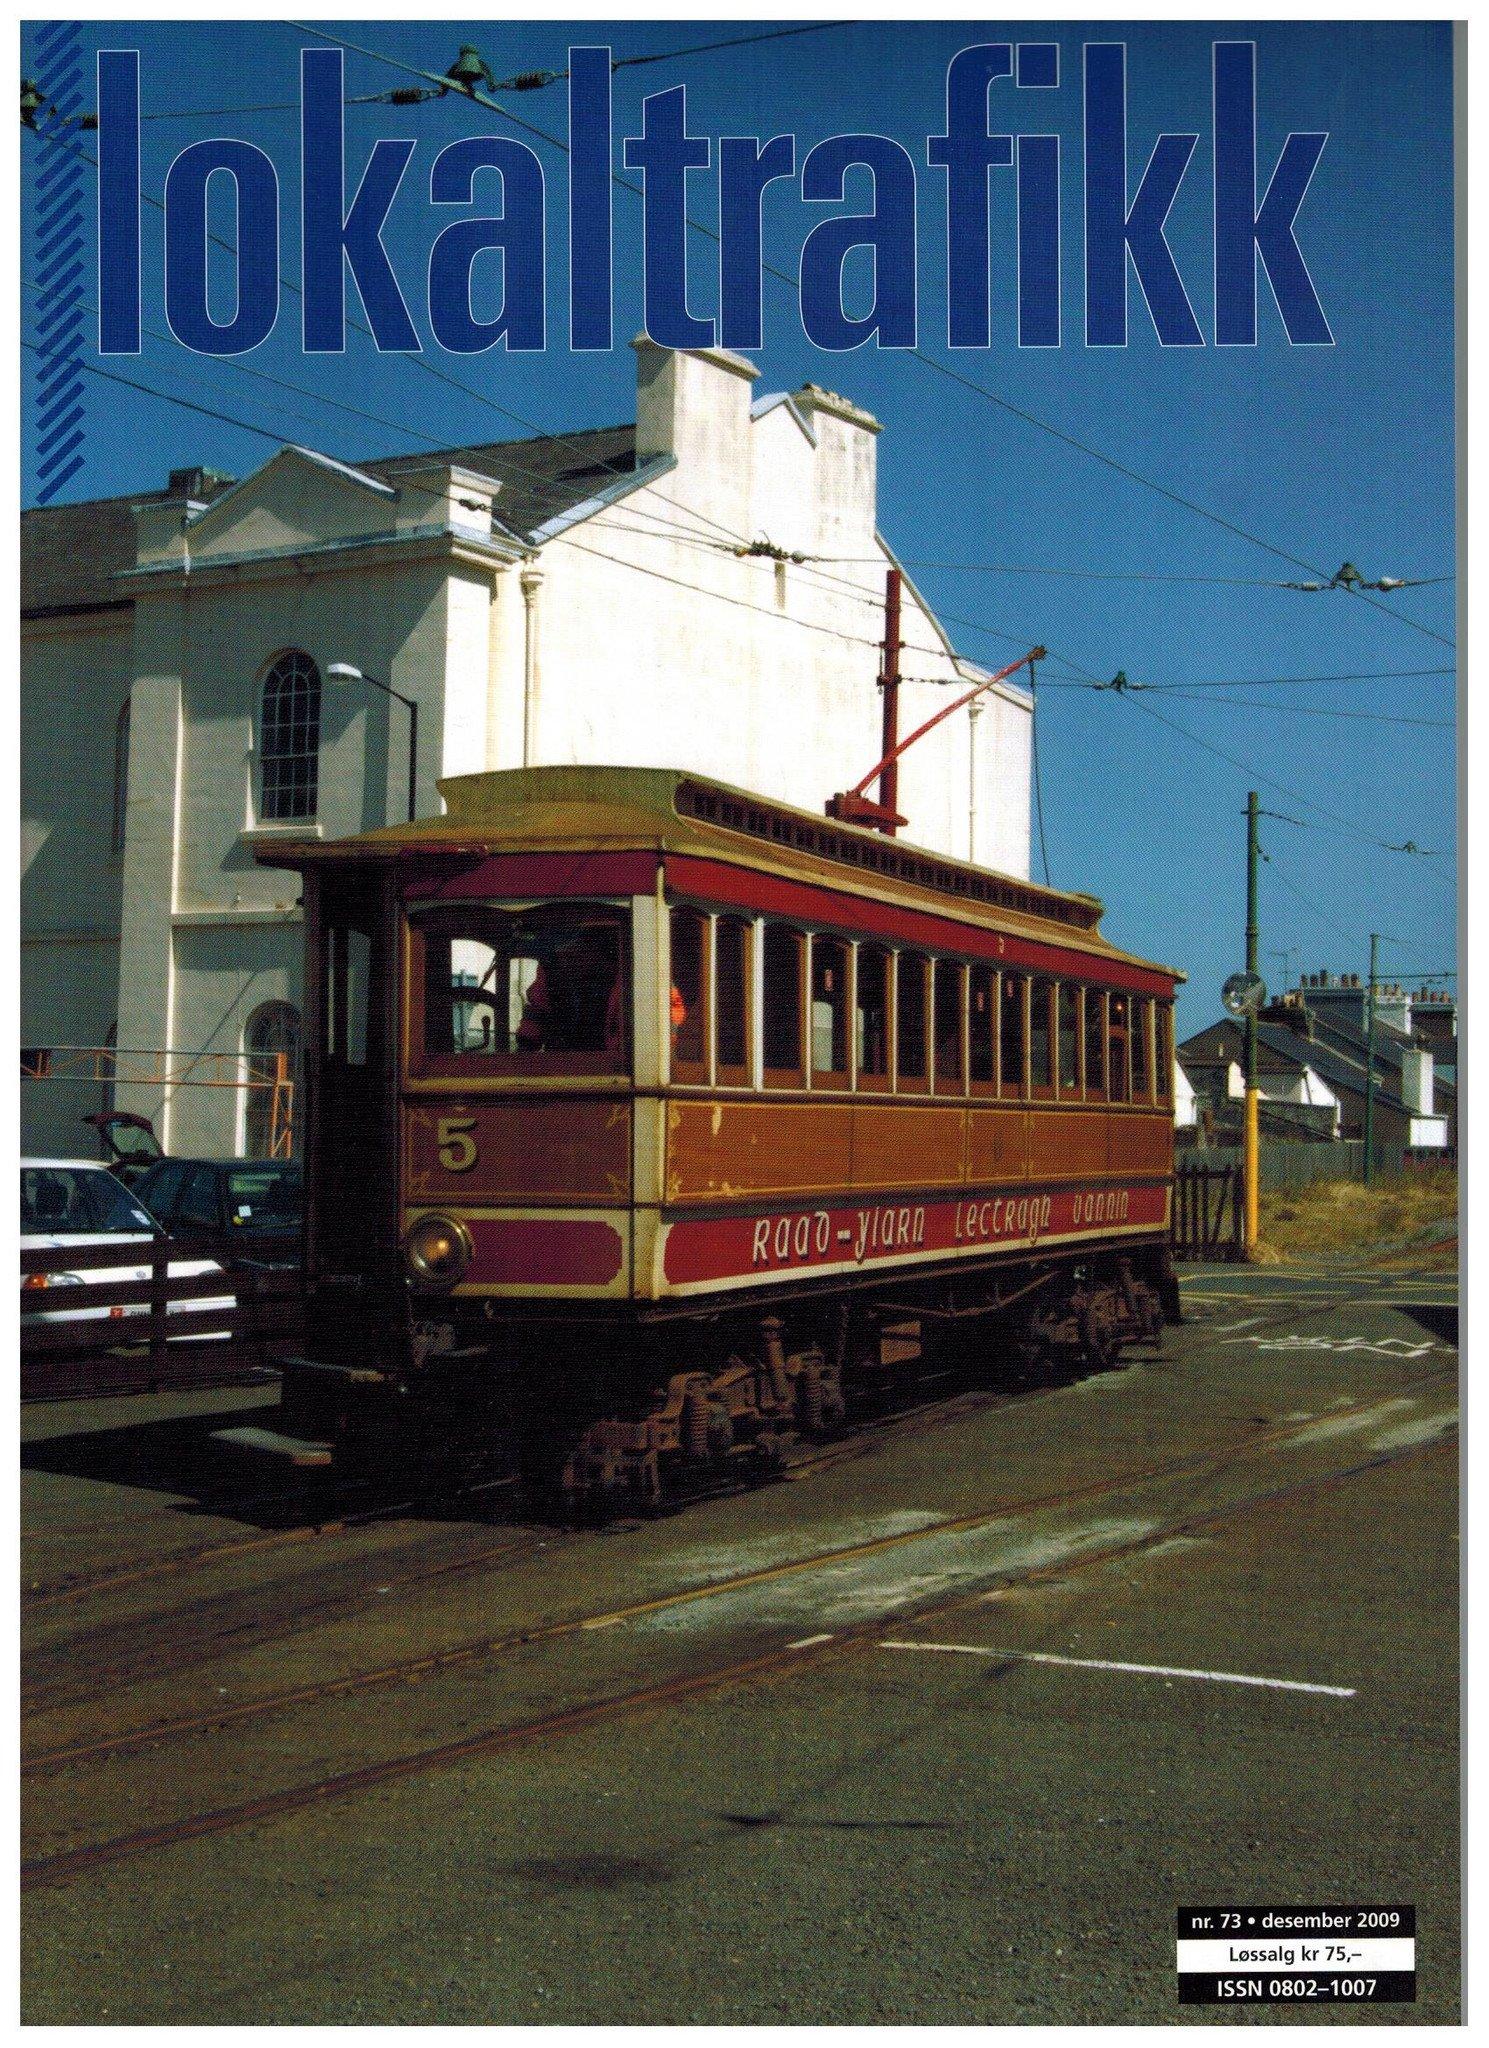 Lokaltrafikk #073